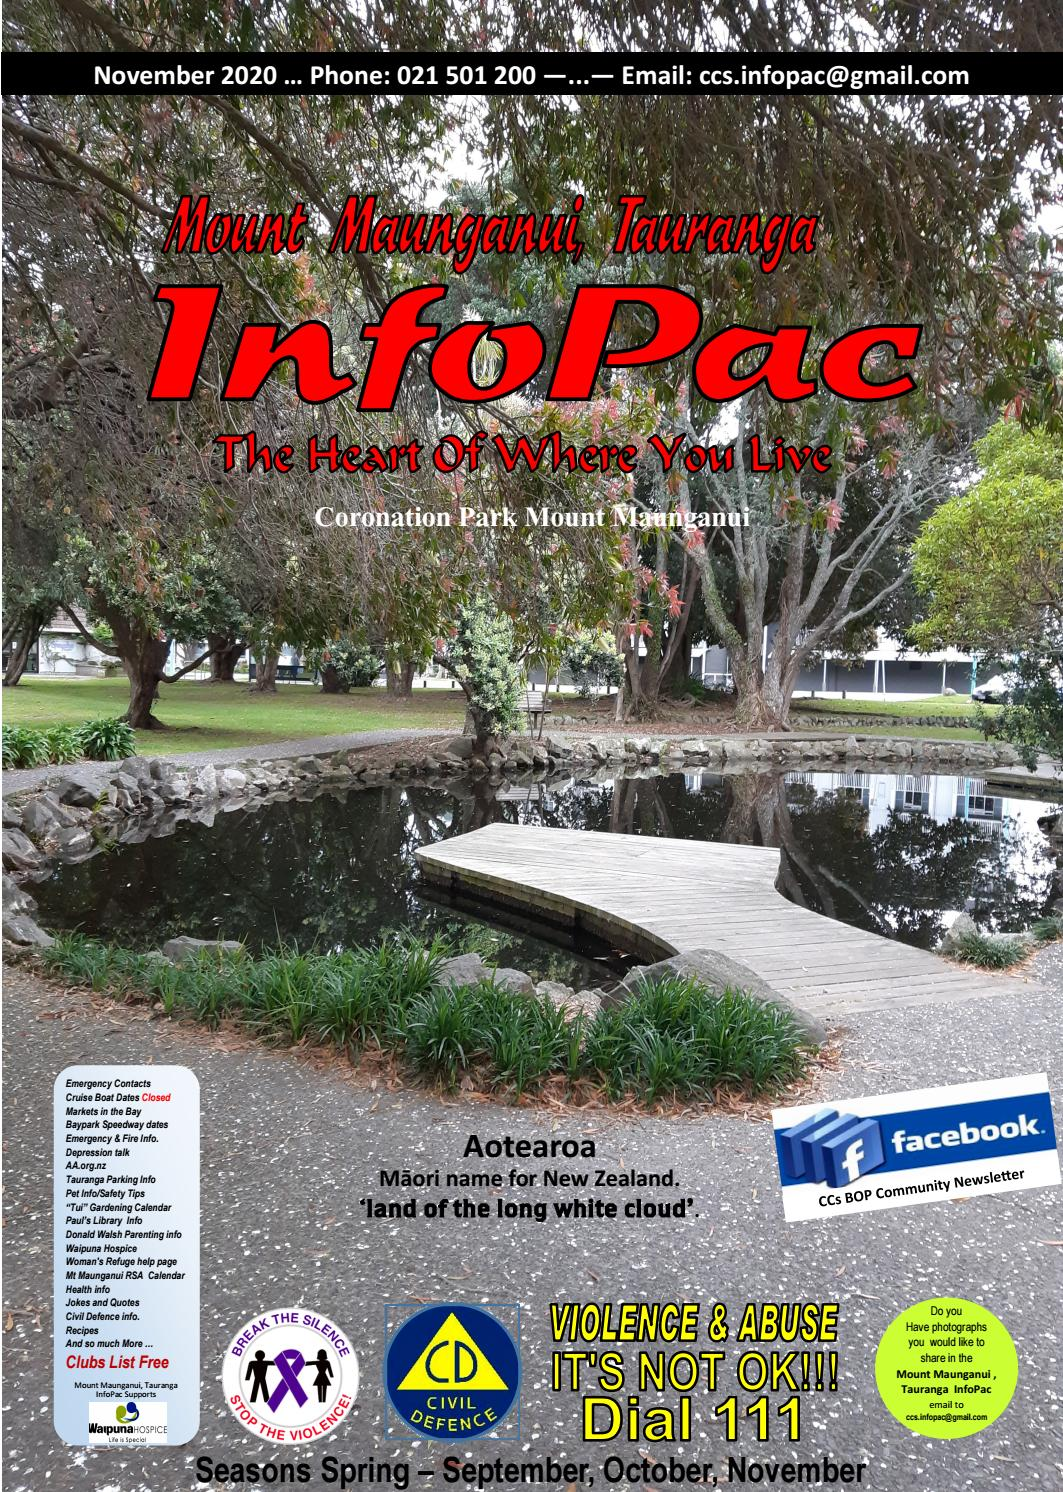 Mount Maunganui Tauranga Infopac November 2020 By Cindy Foster Issuu